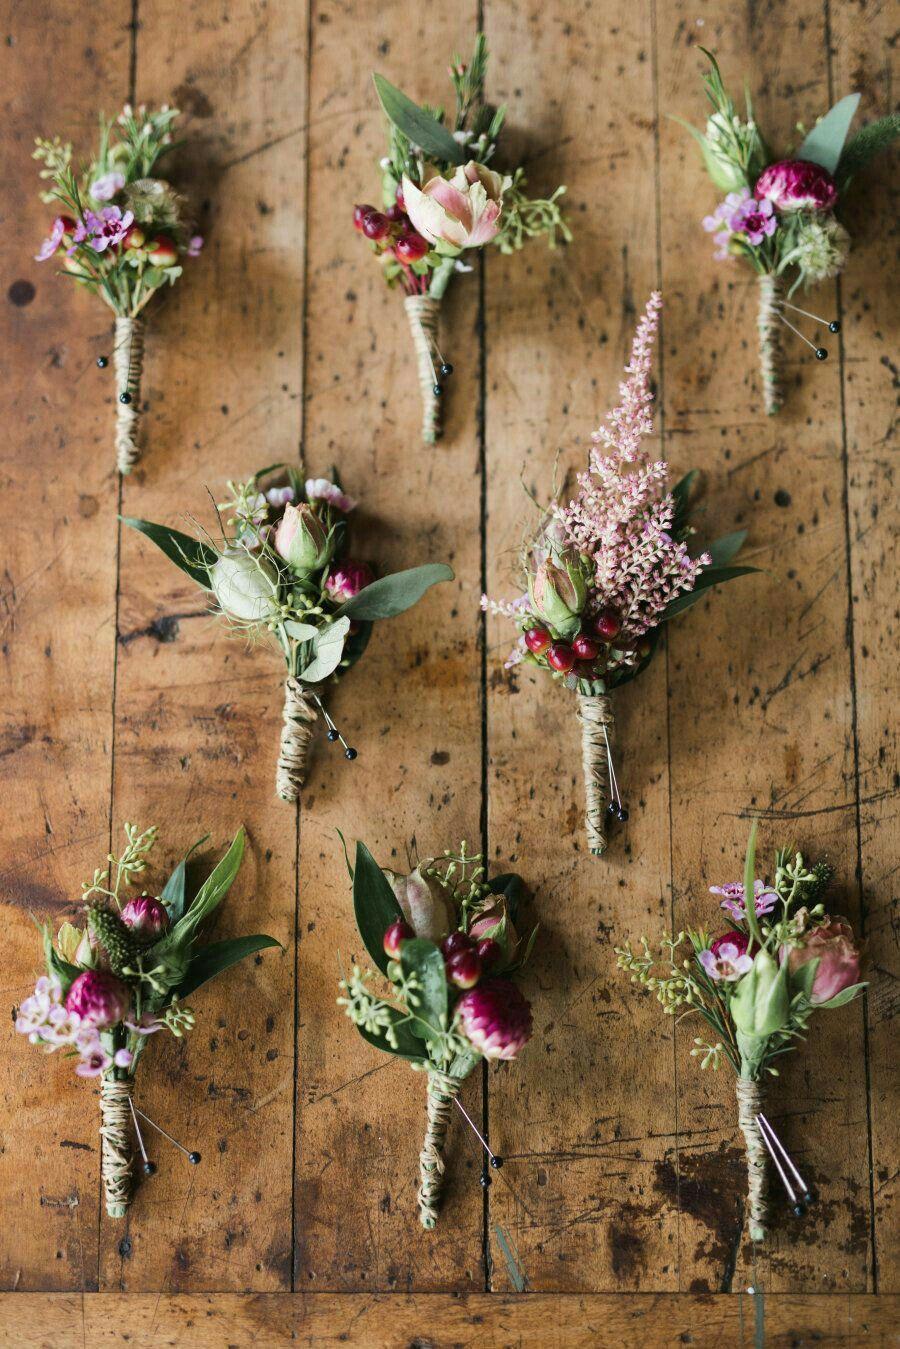 Brautigam Anstecker Furs Revers Anstecker Hochzeit Braut Blumen Brautigam Anstecker